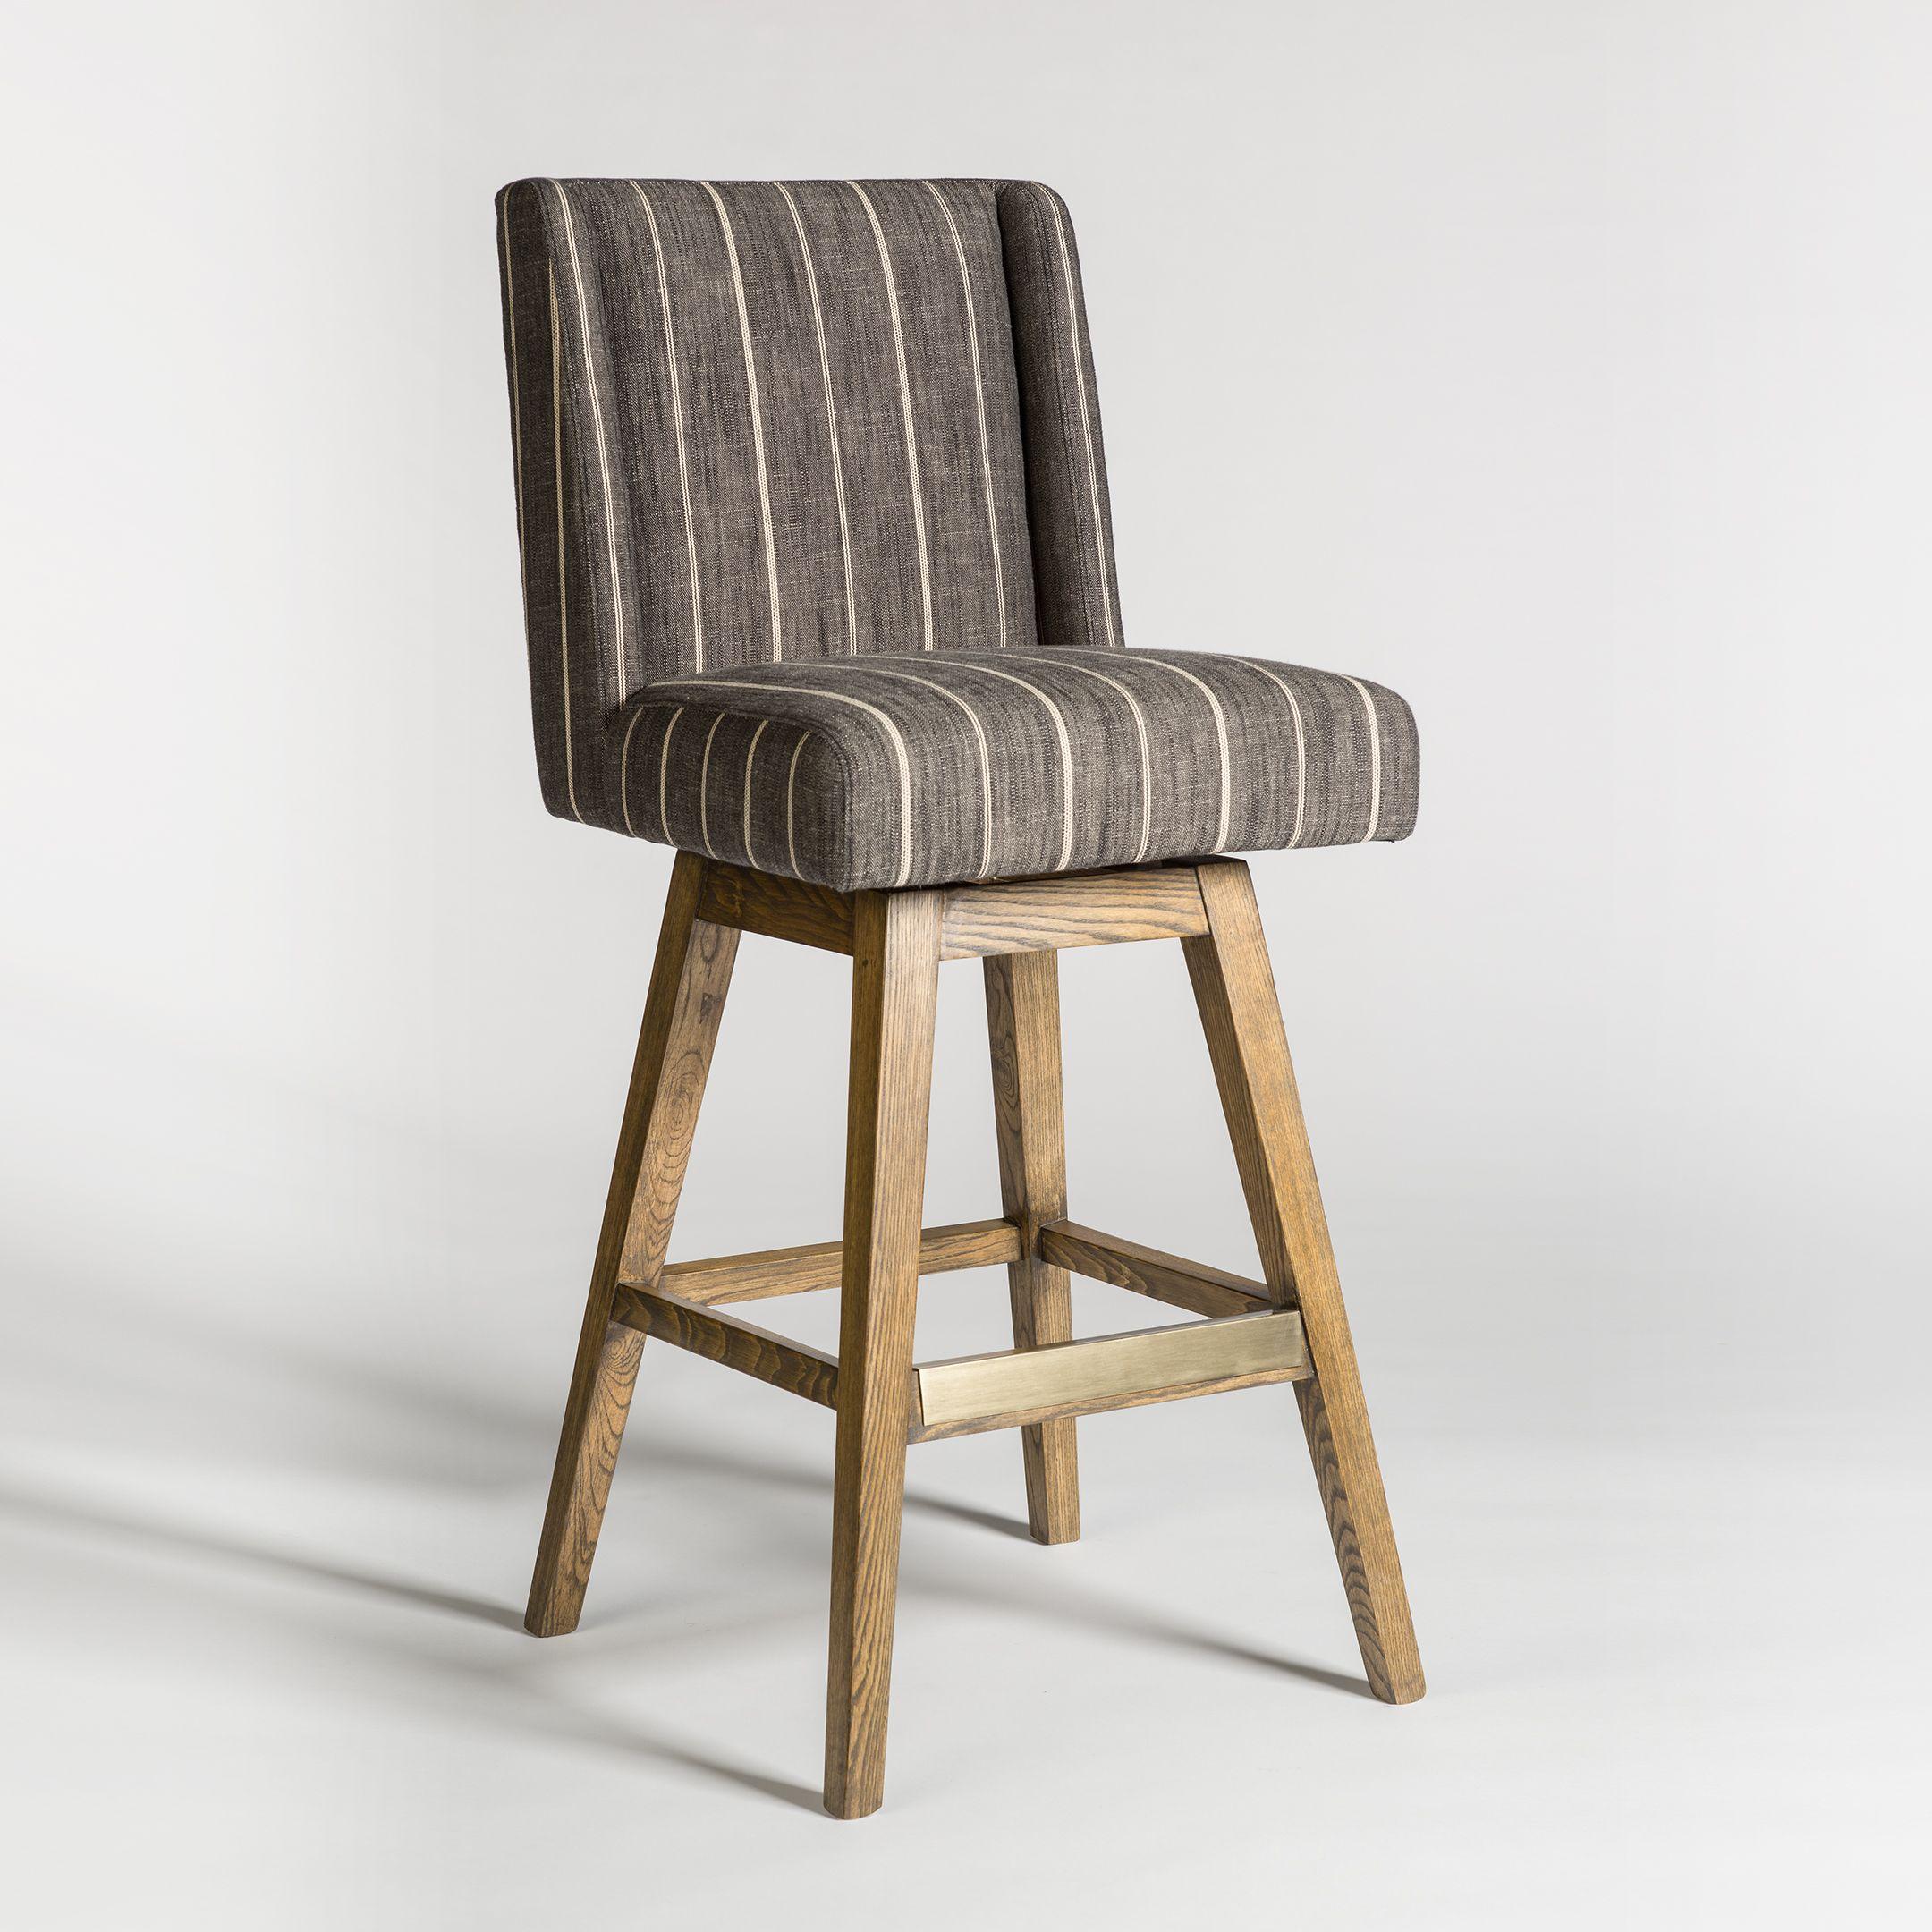 Tribeca swivel bar stool alder tweed furniture home bar counter weathered oak